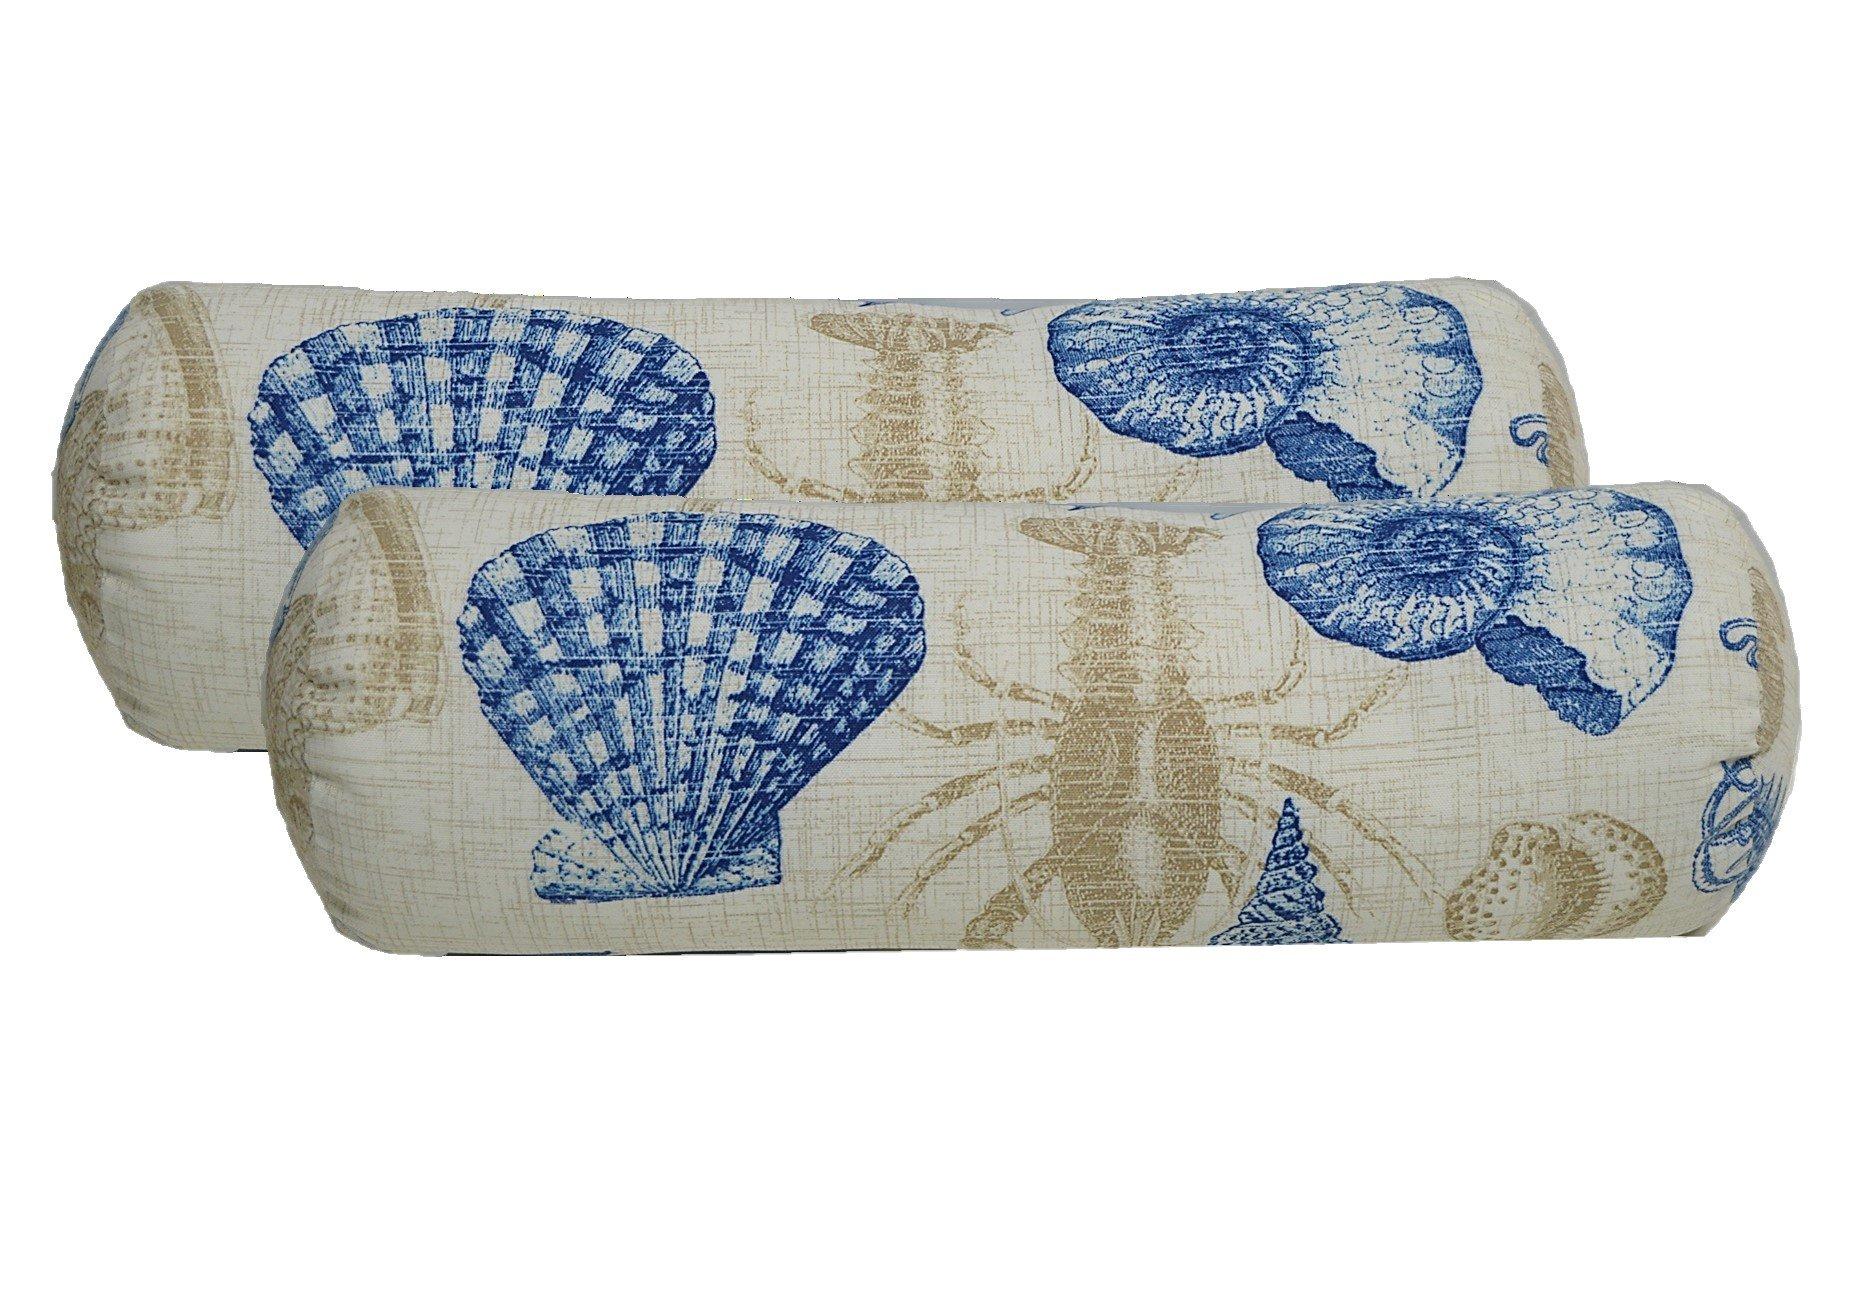 Set of 2 - Indoor / Outdoor Bolster / Neckroll Decorative Pillows - Blue, Tan, Ivory Nautical / Coastal Fish, Crab, Seashell, Octopus, Seahorse Fabric